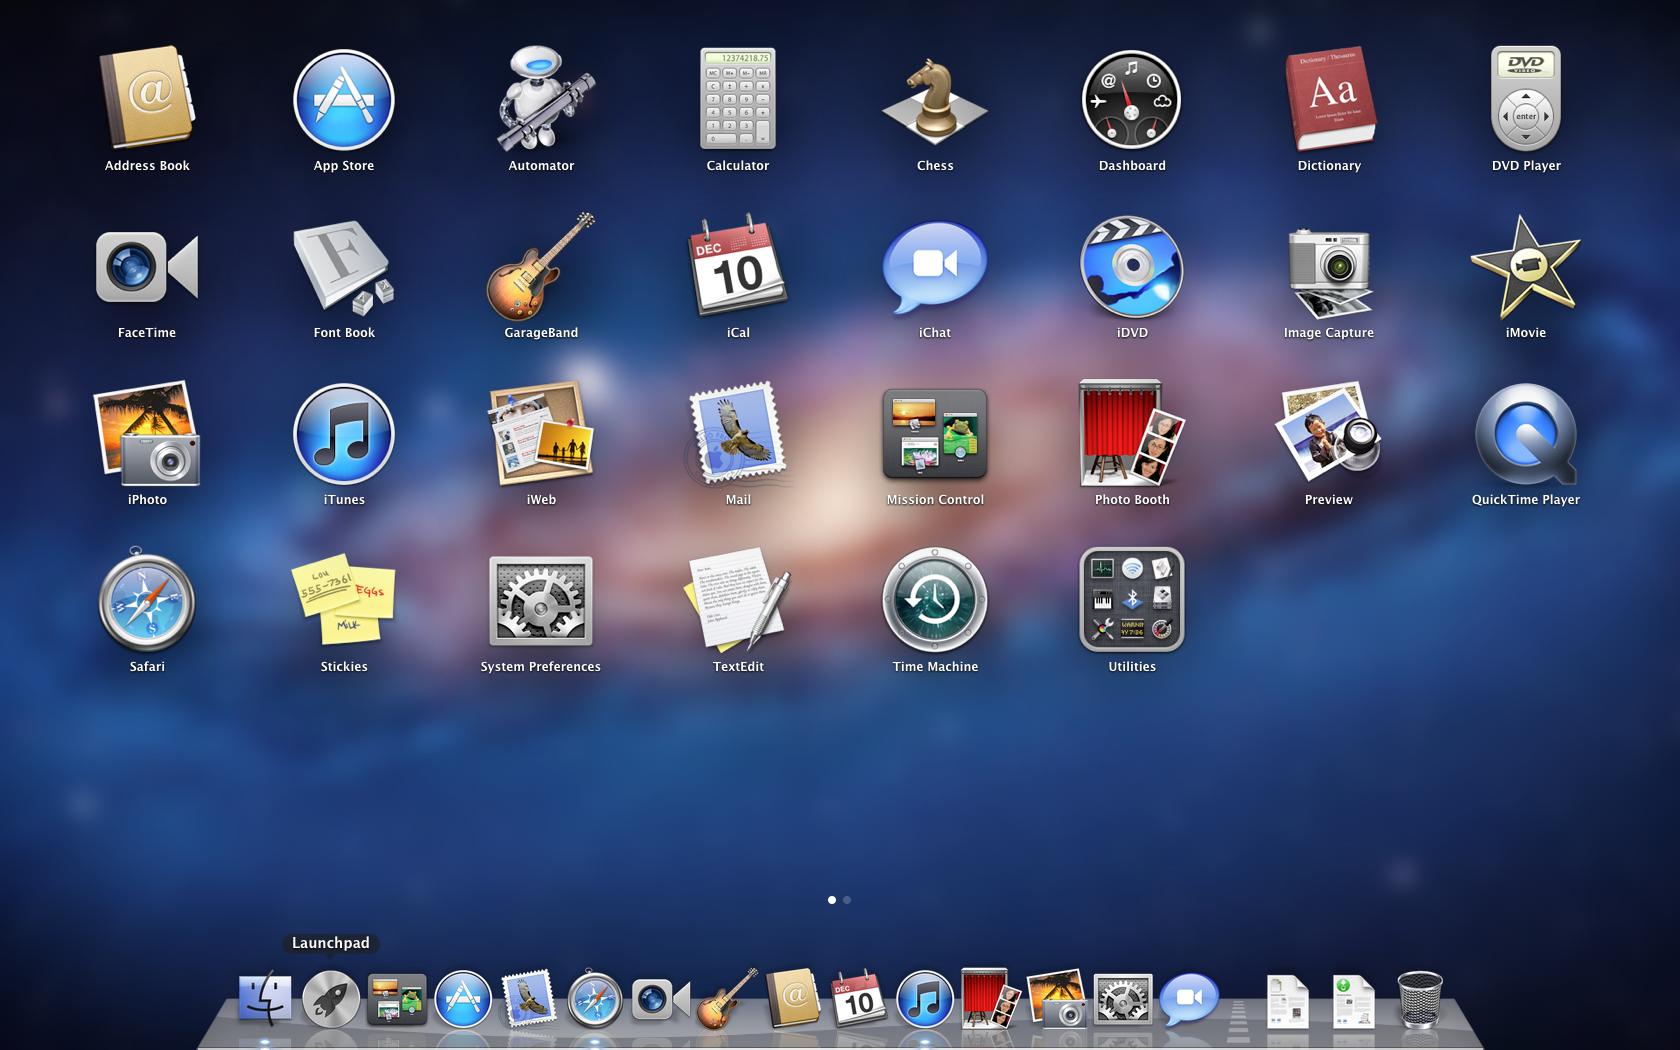 Mac Basics: Applications, files, and folders (OS X Lion)